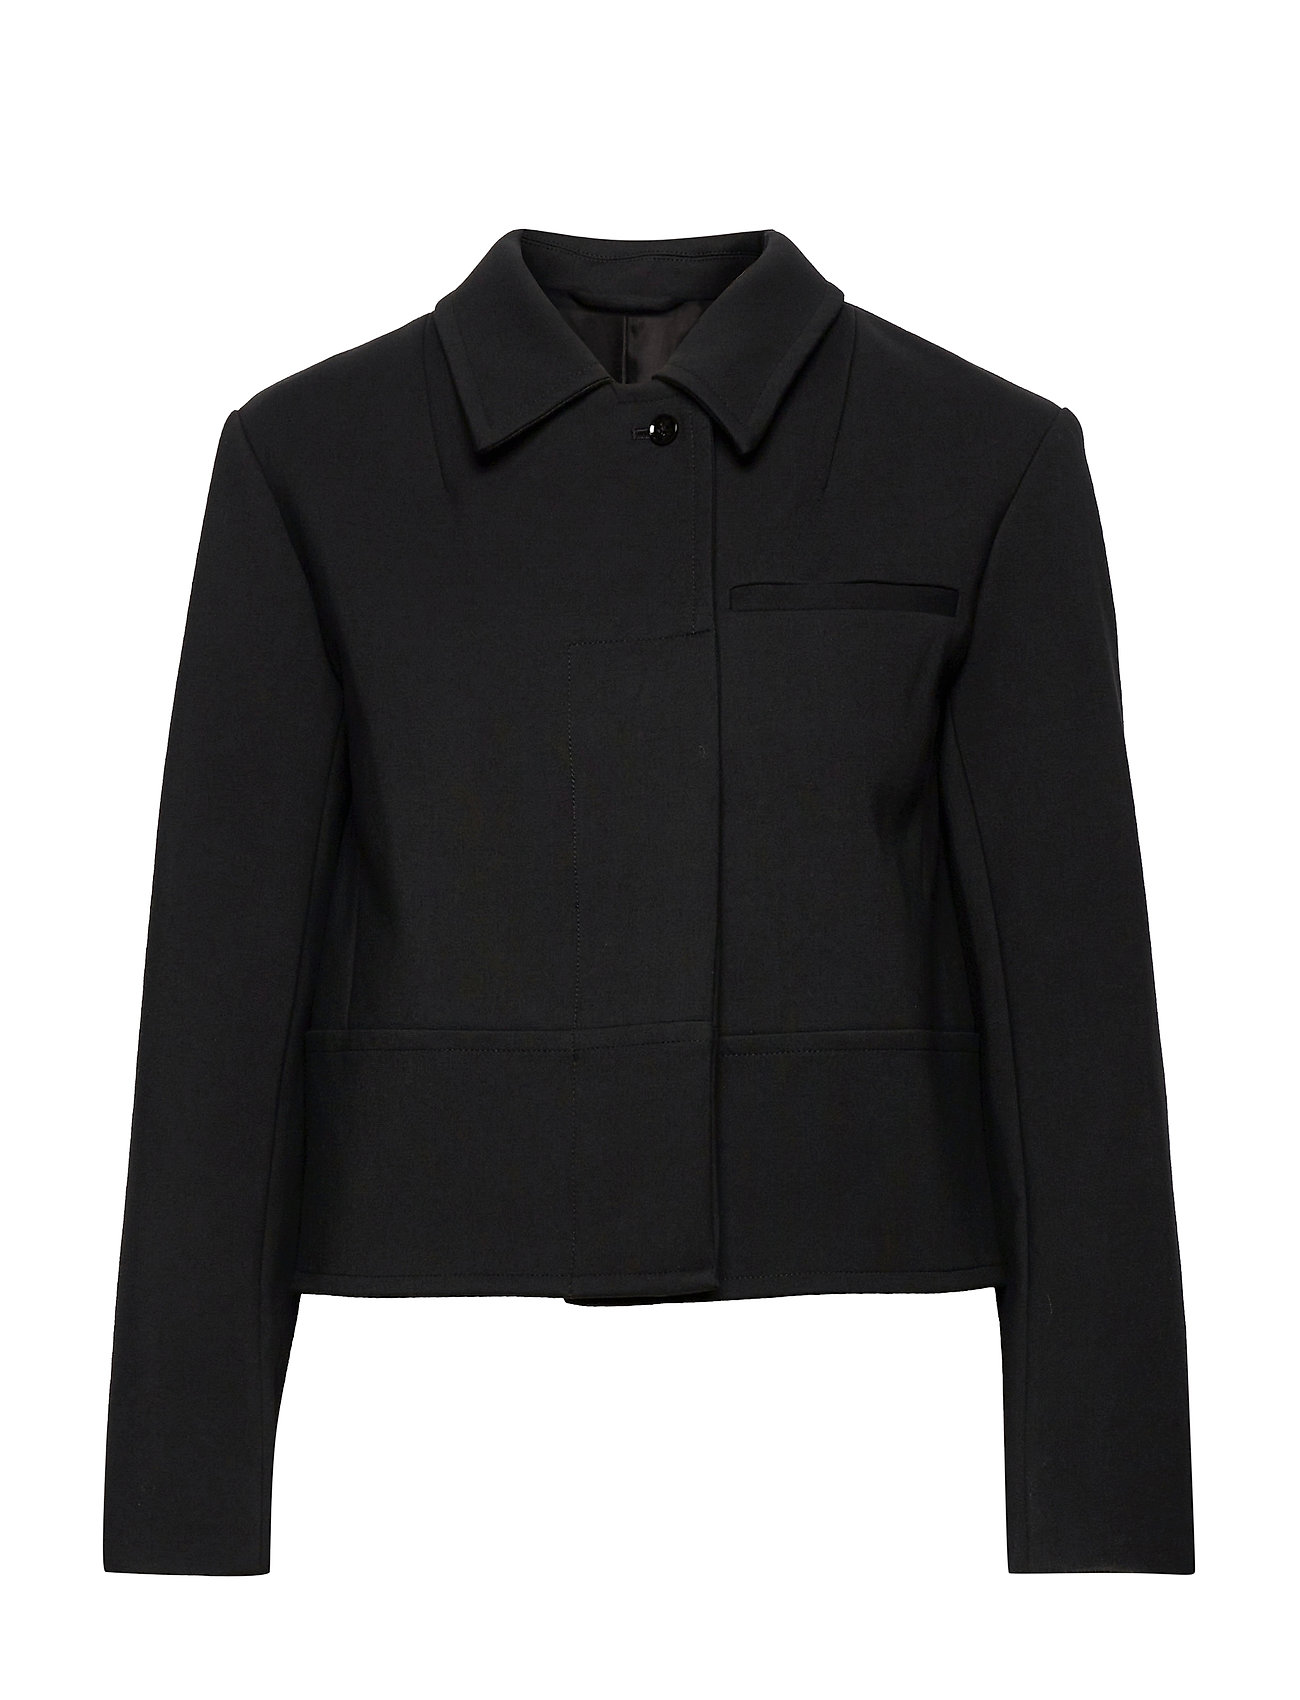 P212-6183elv / Convertible Collar Valet Jacket Blazers Bouclé Blazers Sort 3.1 Phillip Lim